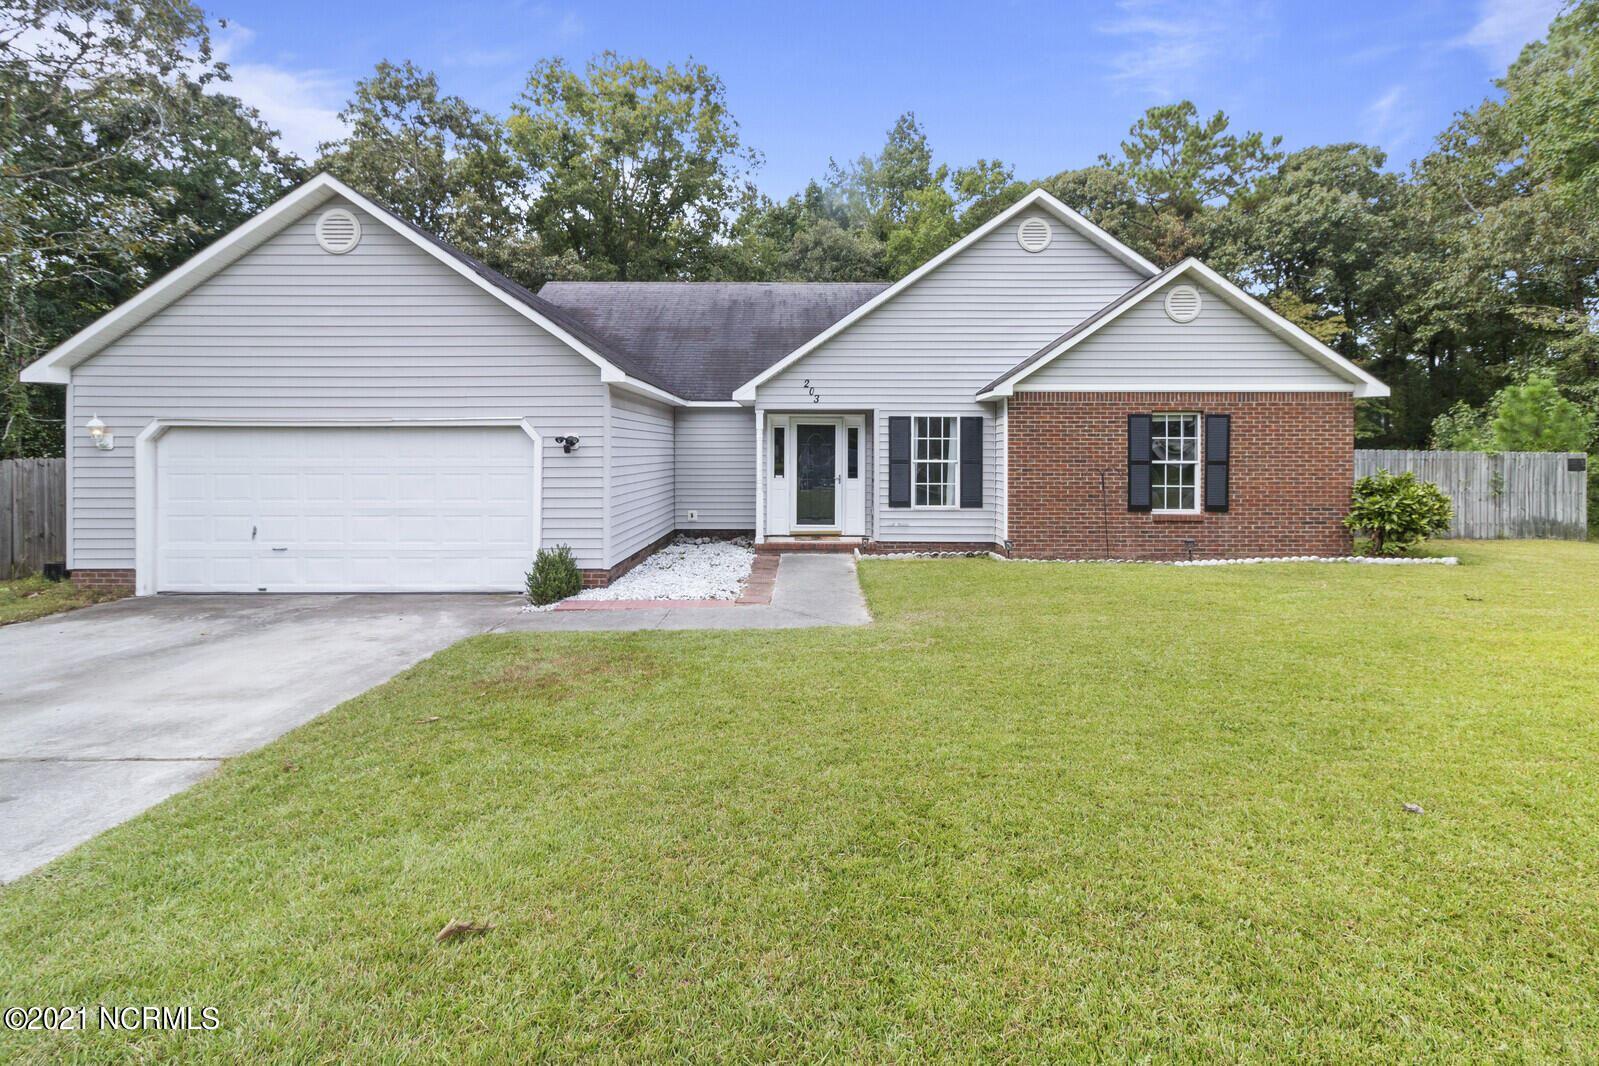 Photo of 203 Worthington Place, Jacksonville, NC 28546 (MLS # 100293551)